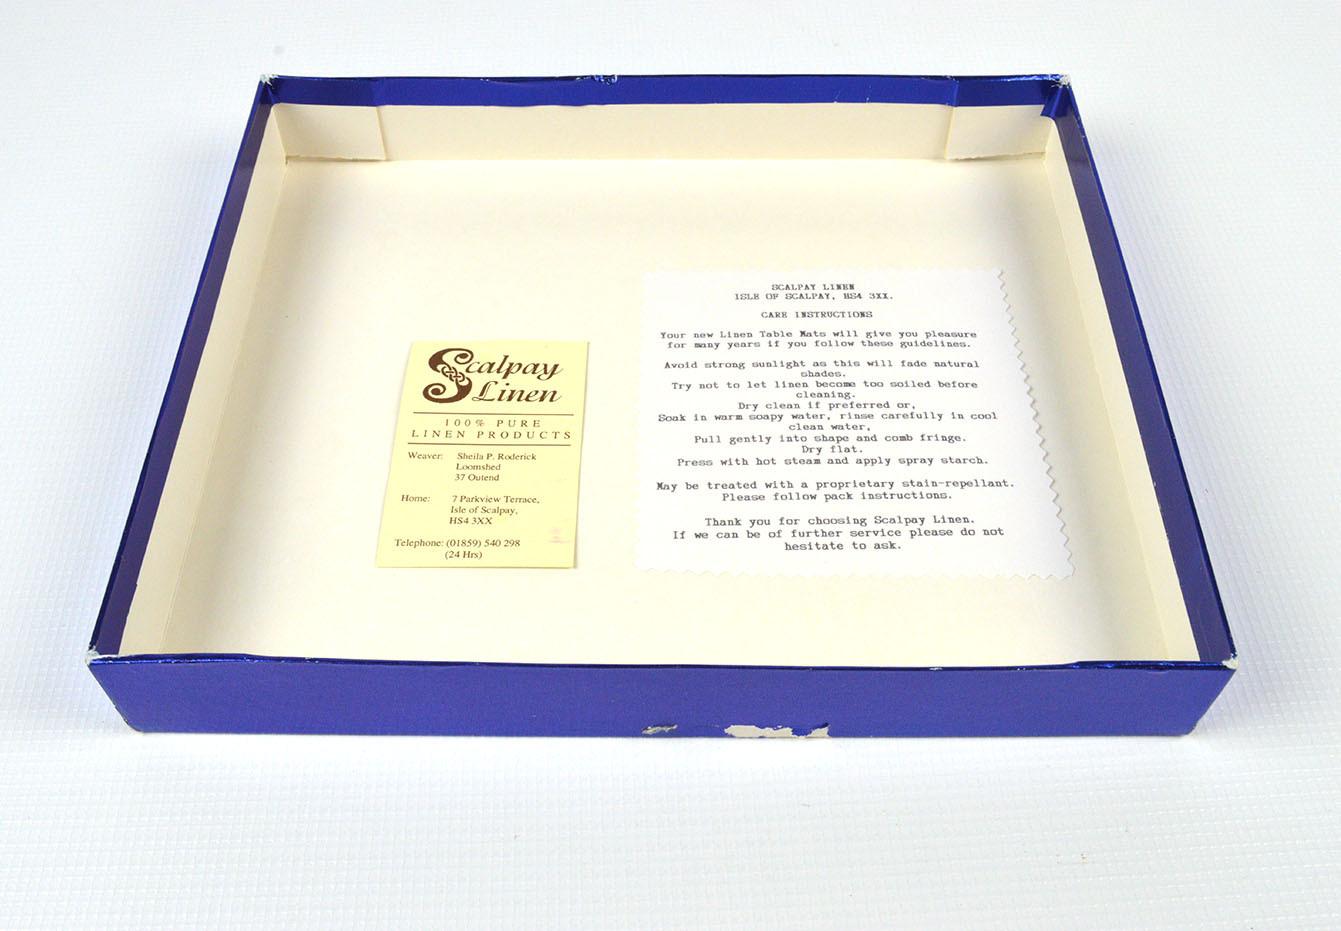 Scalpay Linen Box